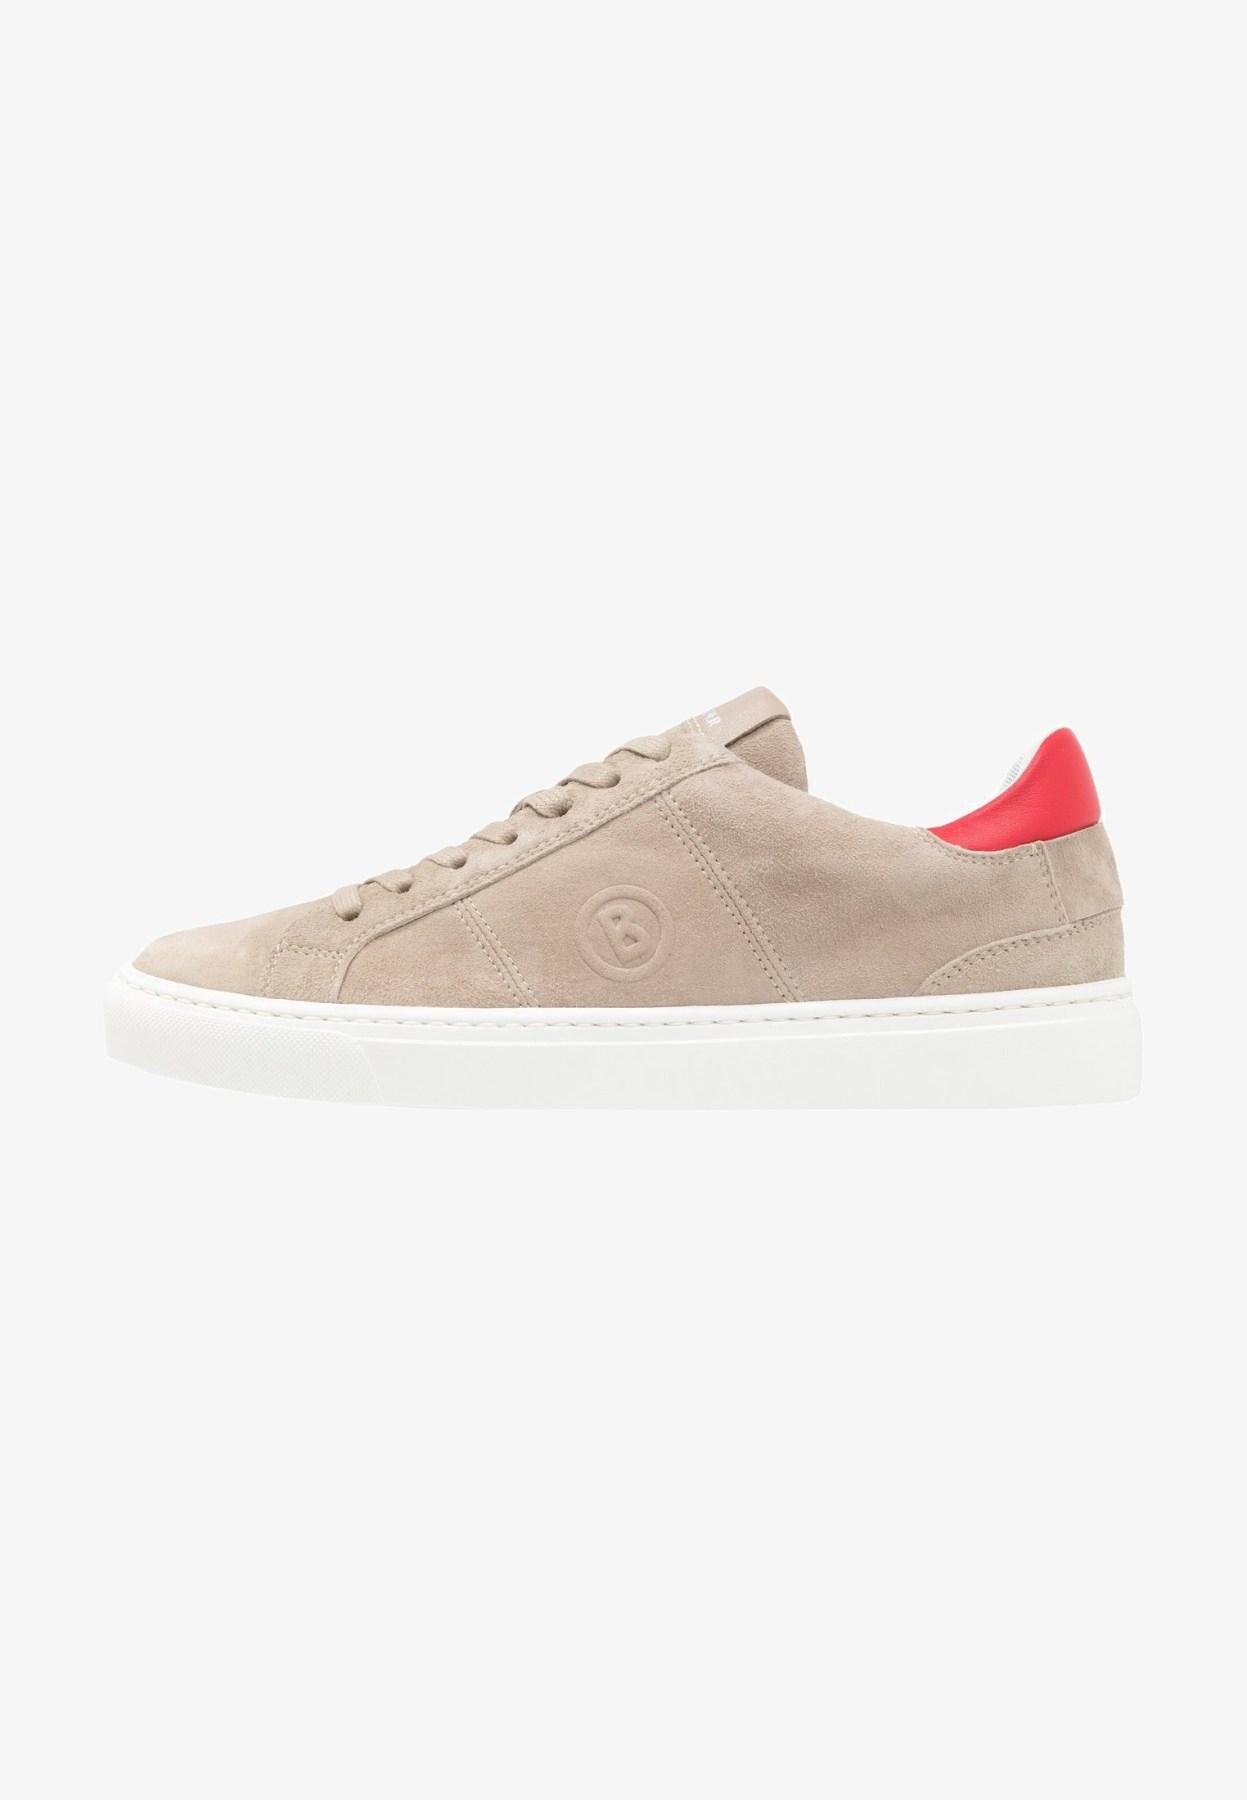 finest selection dfedd ddef4 BOGNER New Salzburg 26B Sneaker/Schuhe Leder, Size: 37 EU -to- 40 EU /  Nature | Fashion-House